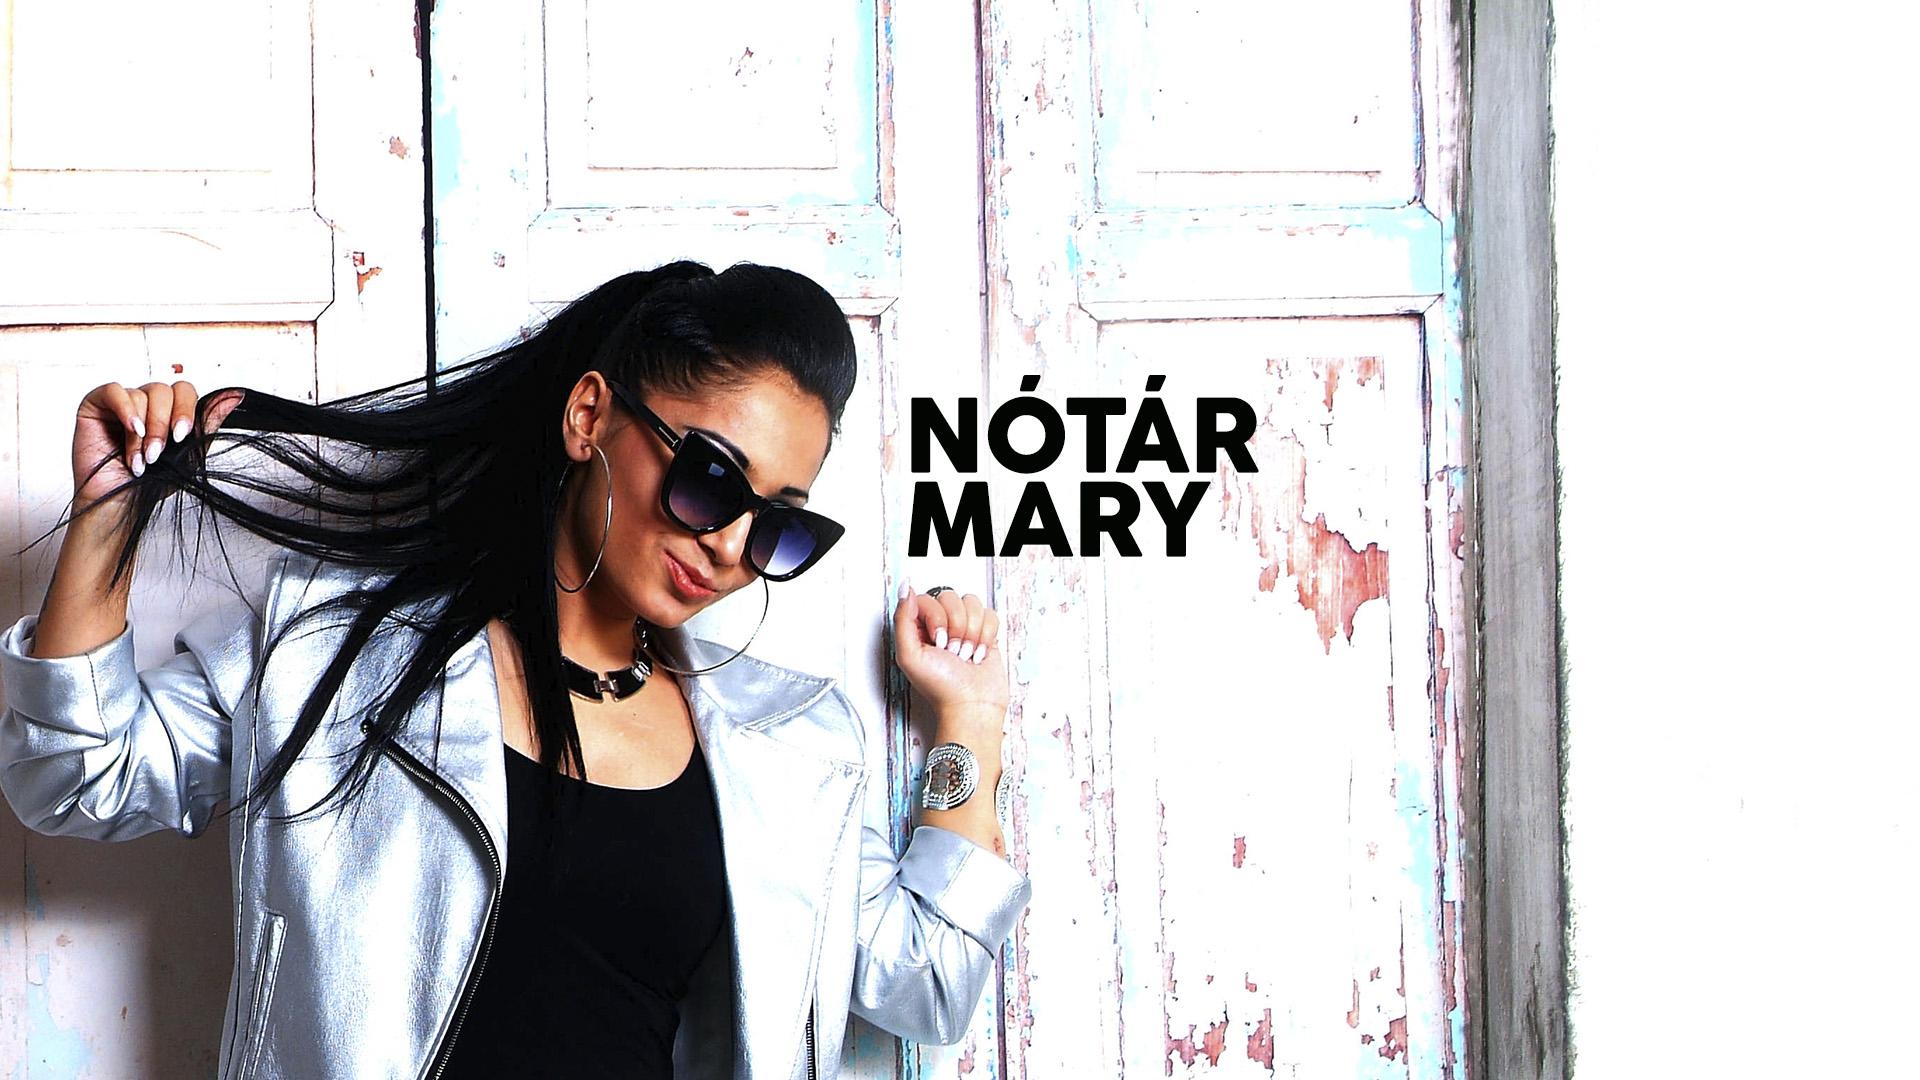 NÓTÁR MARY